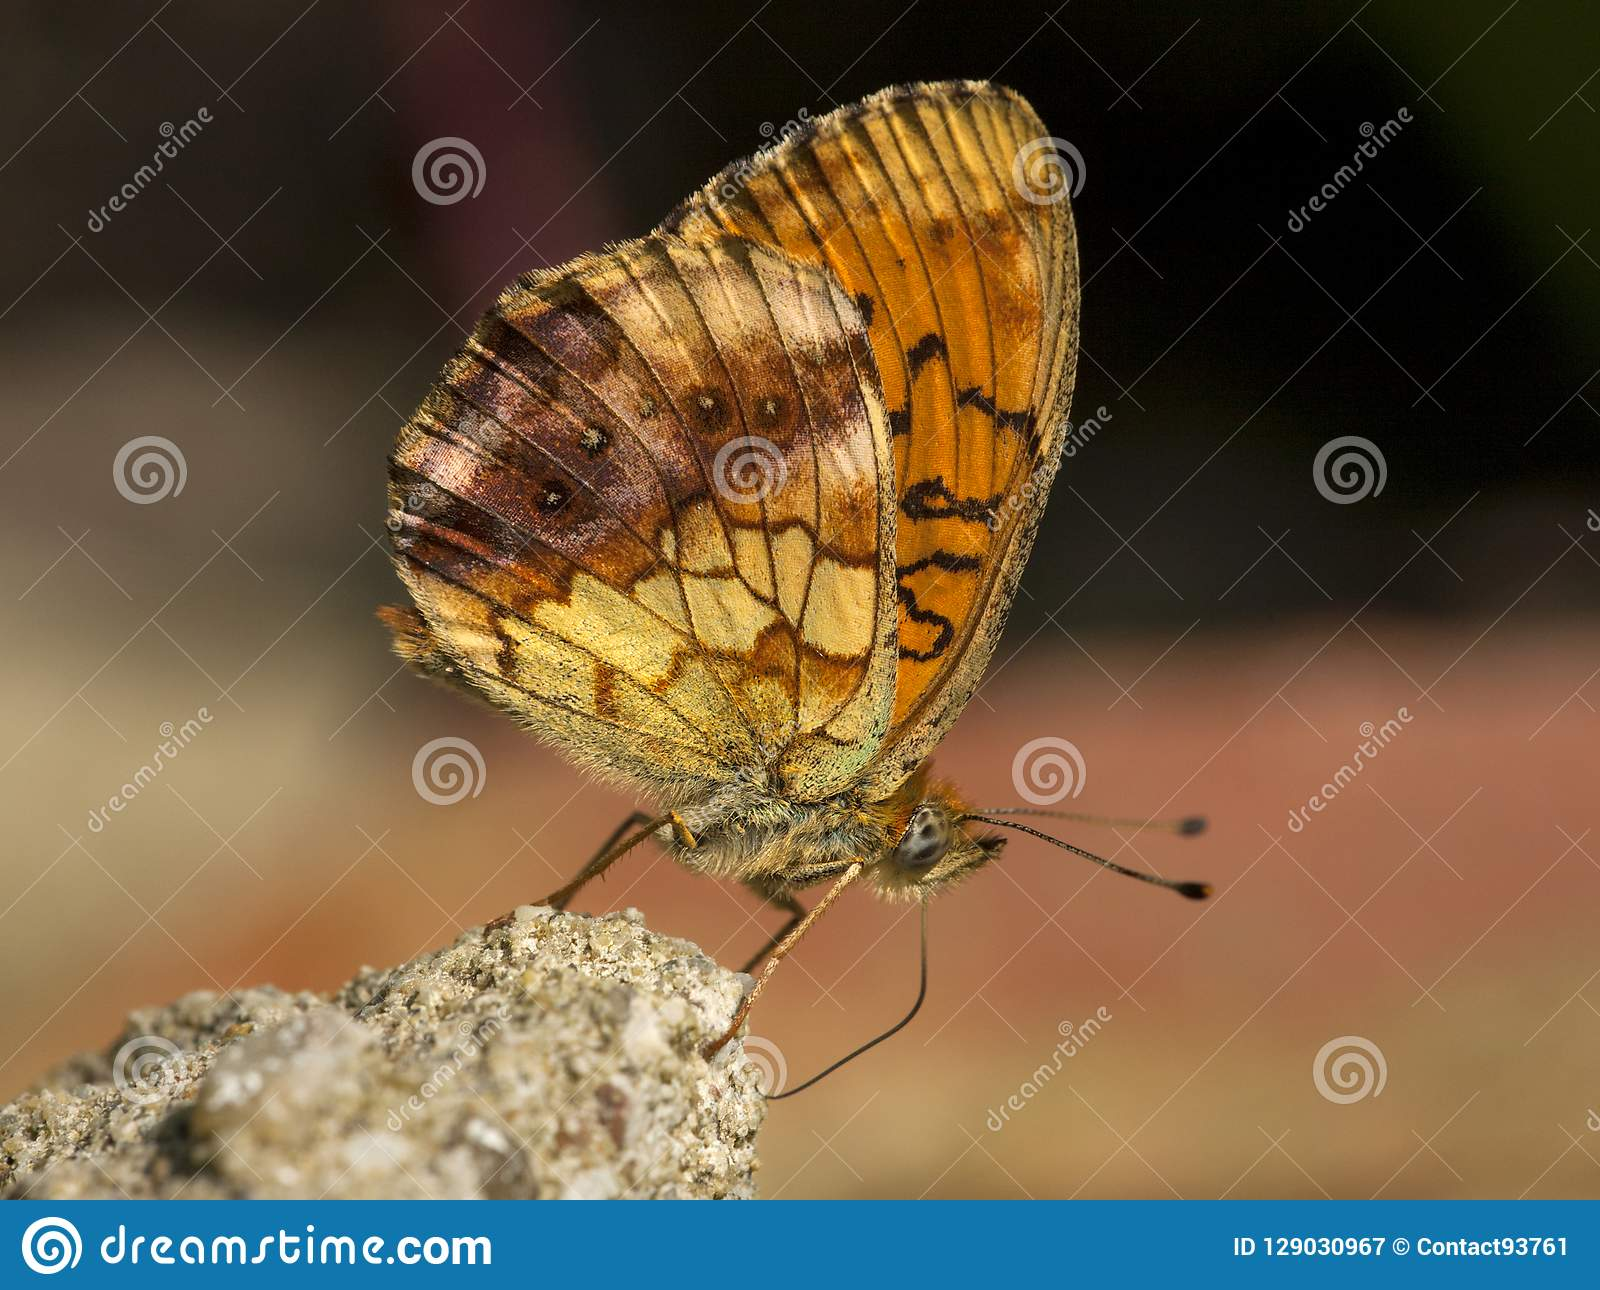 Braamparelmoervlinder, Marbled Fritillary, Brenthis daphne